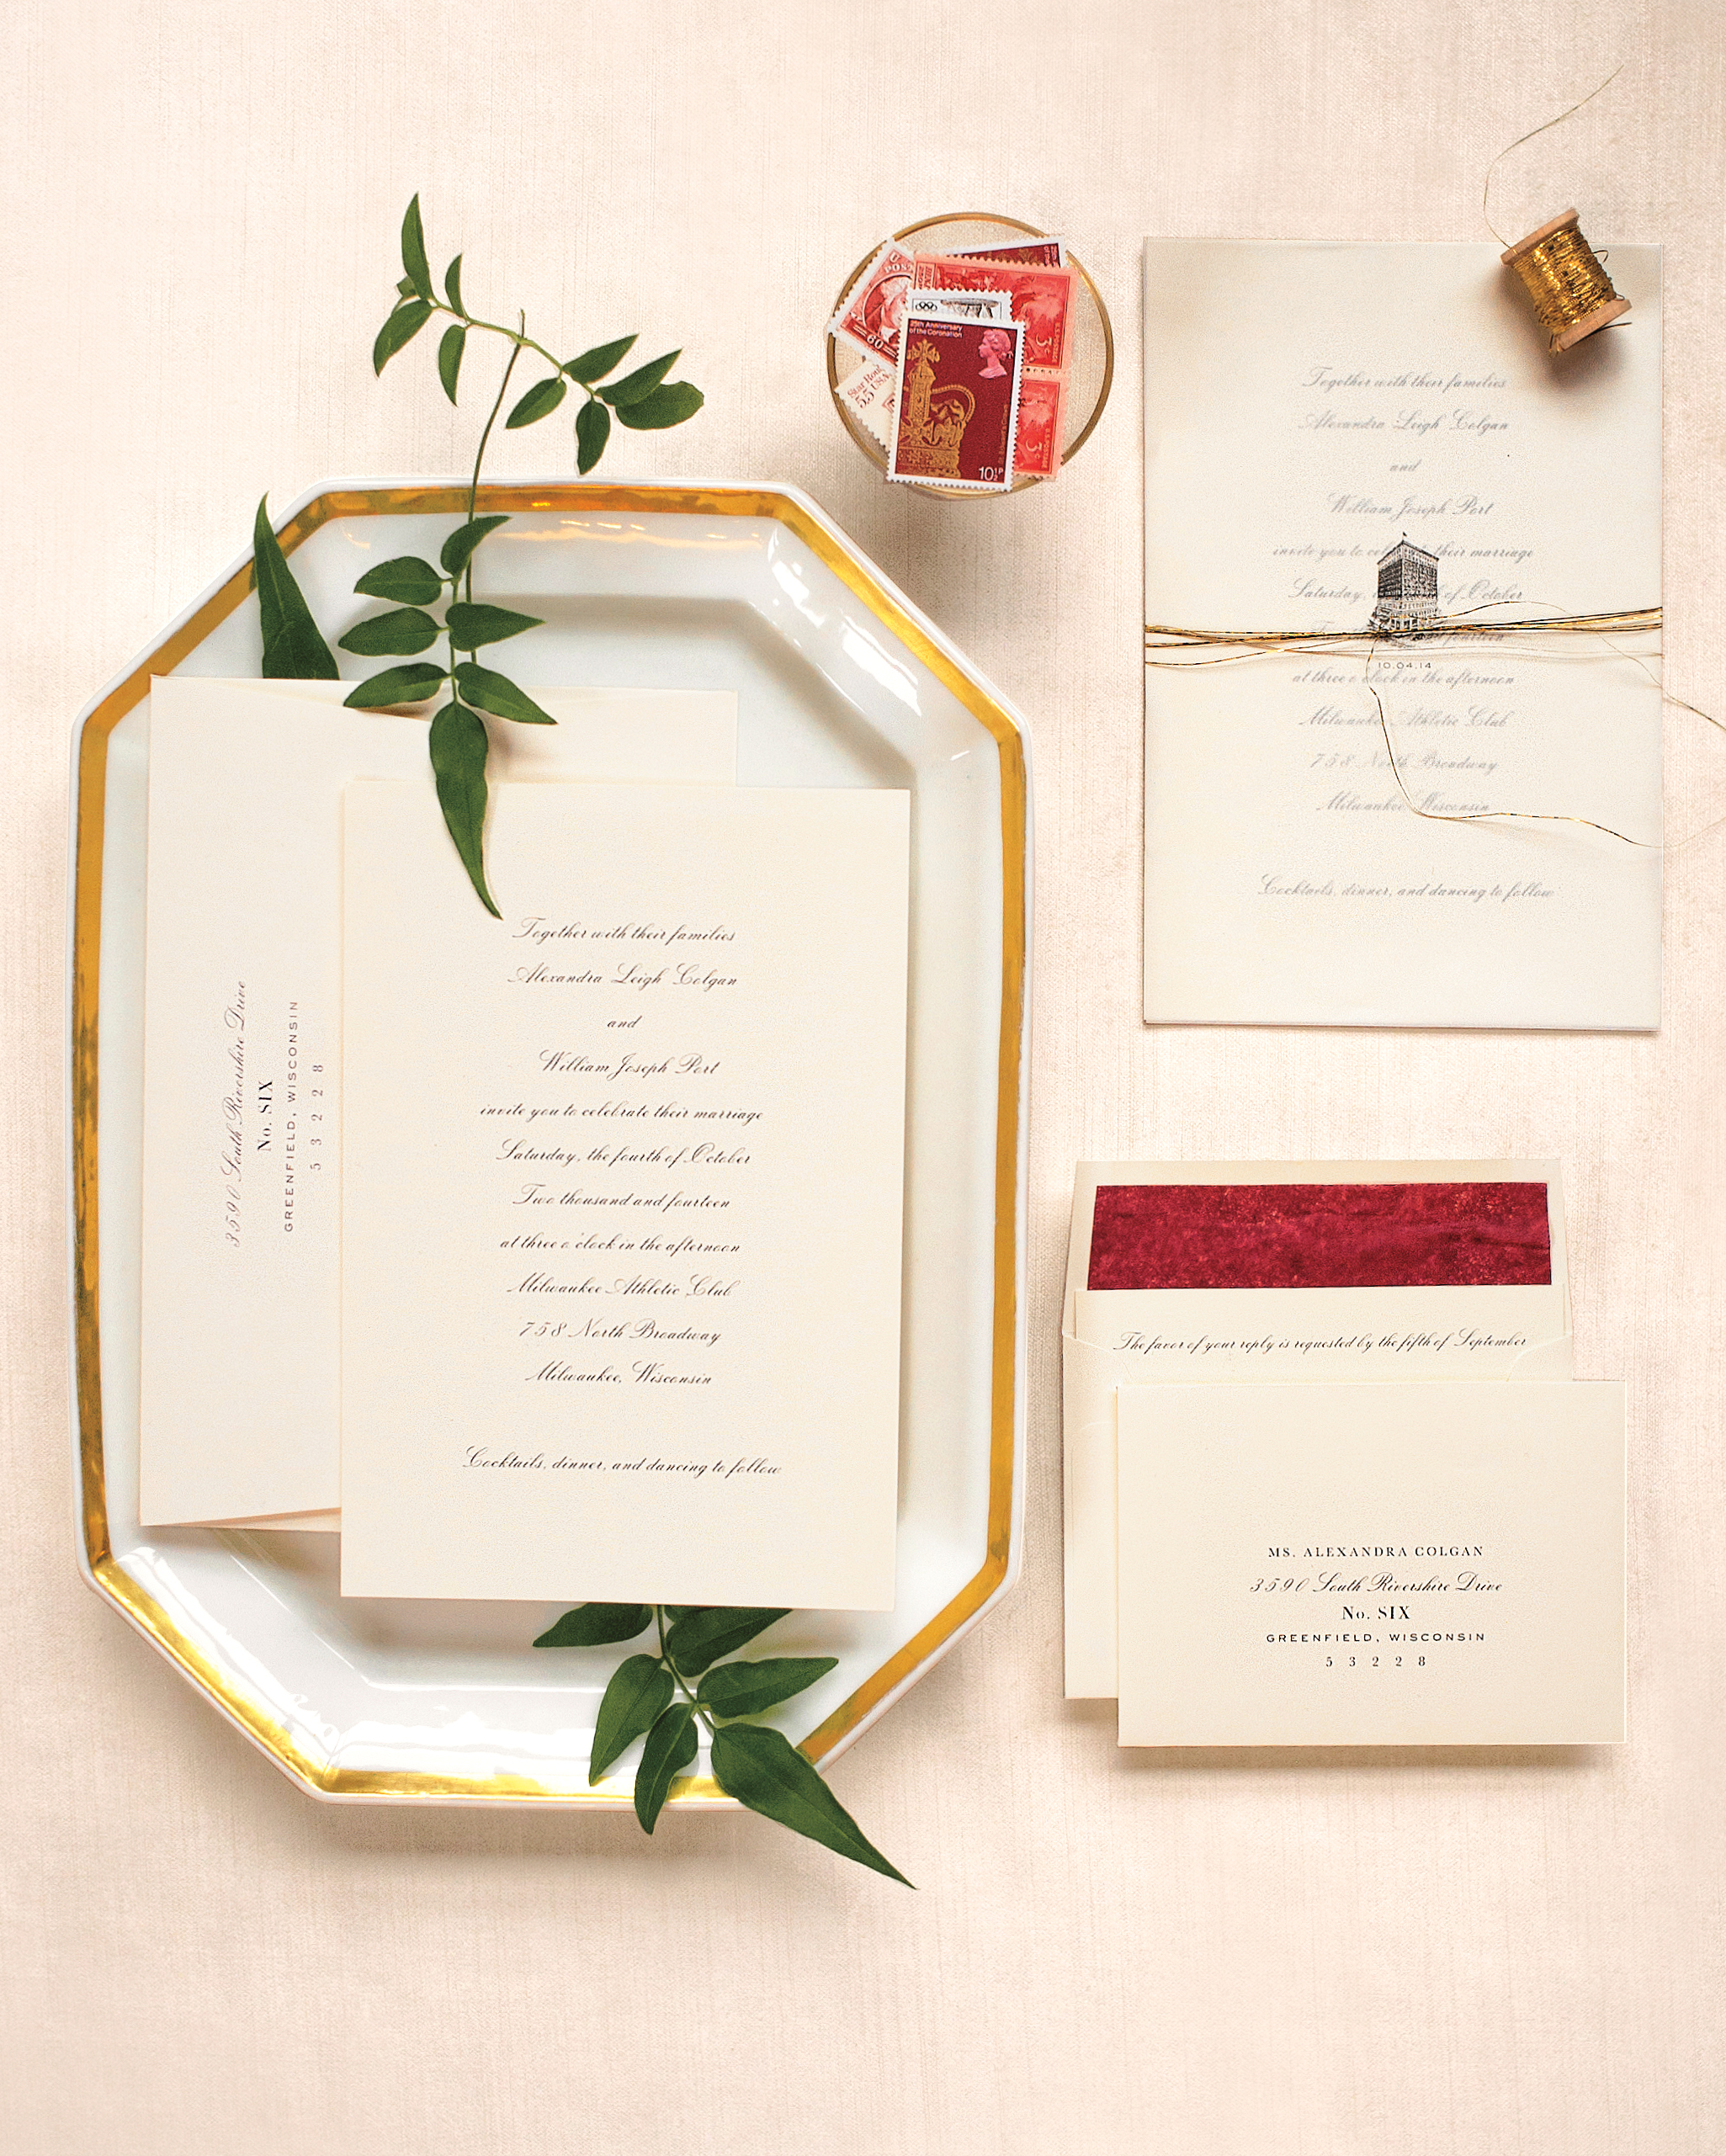 alix-bill-wedding-62-d3s-0200-2014-32-d111617.jpg